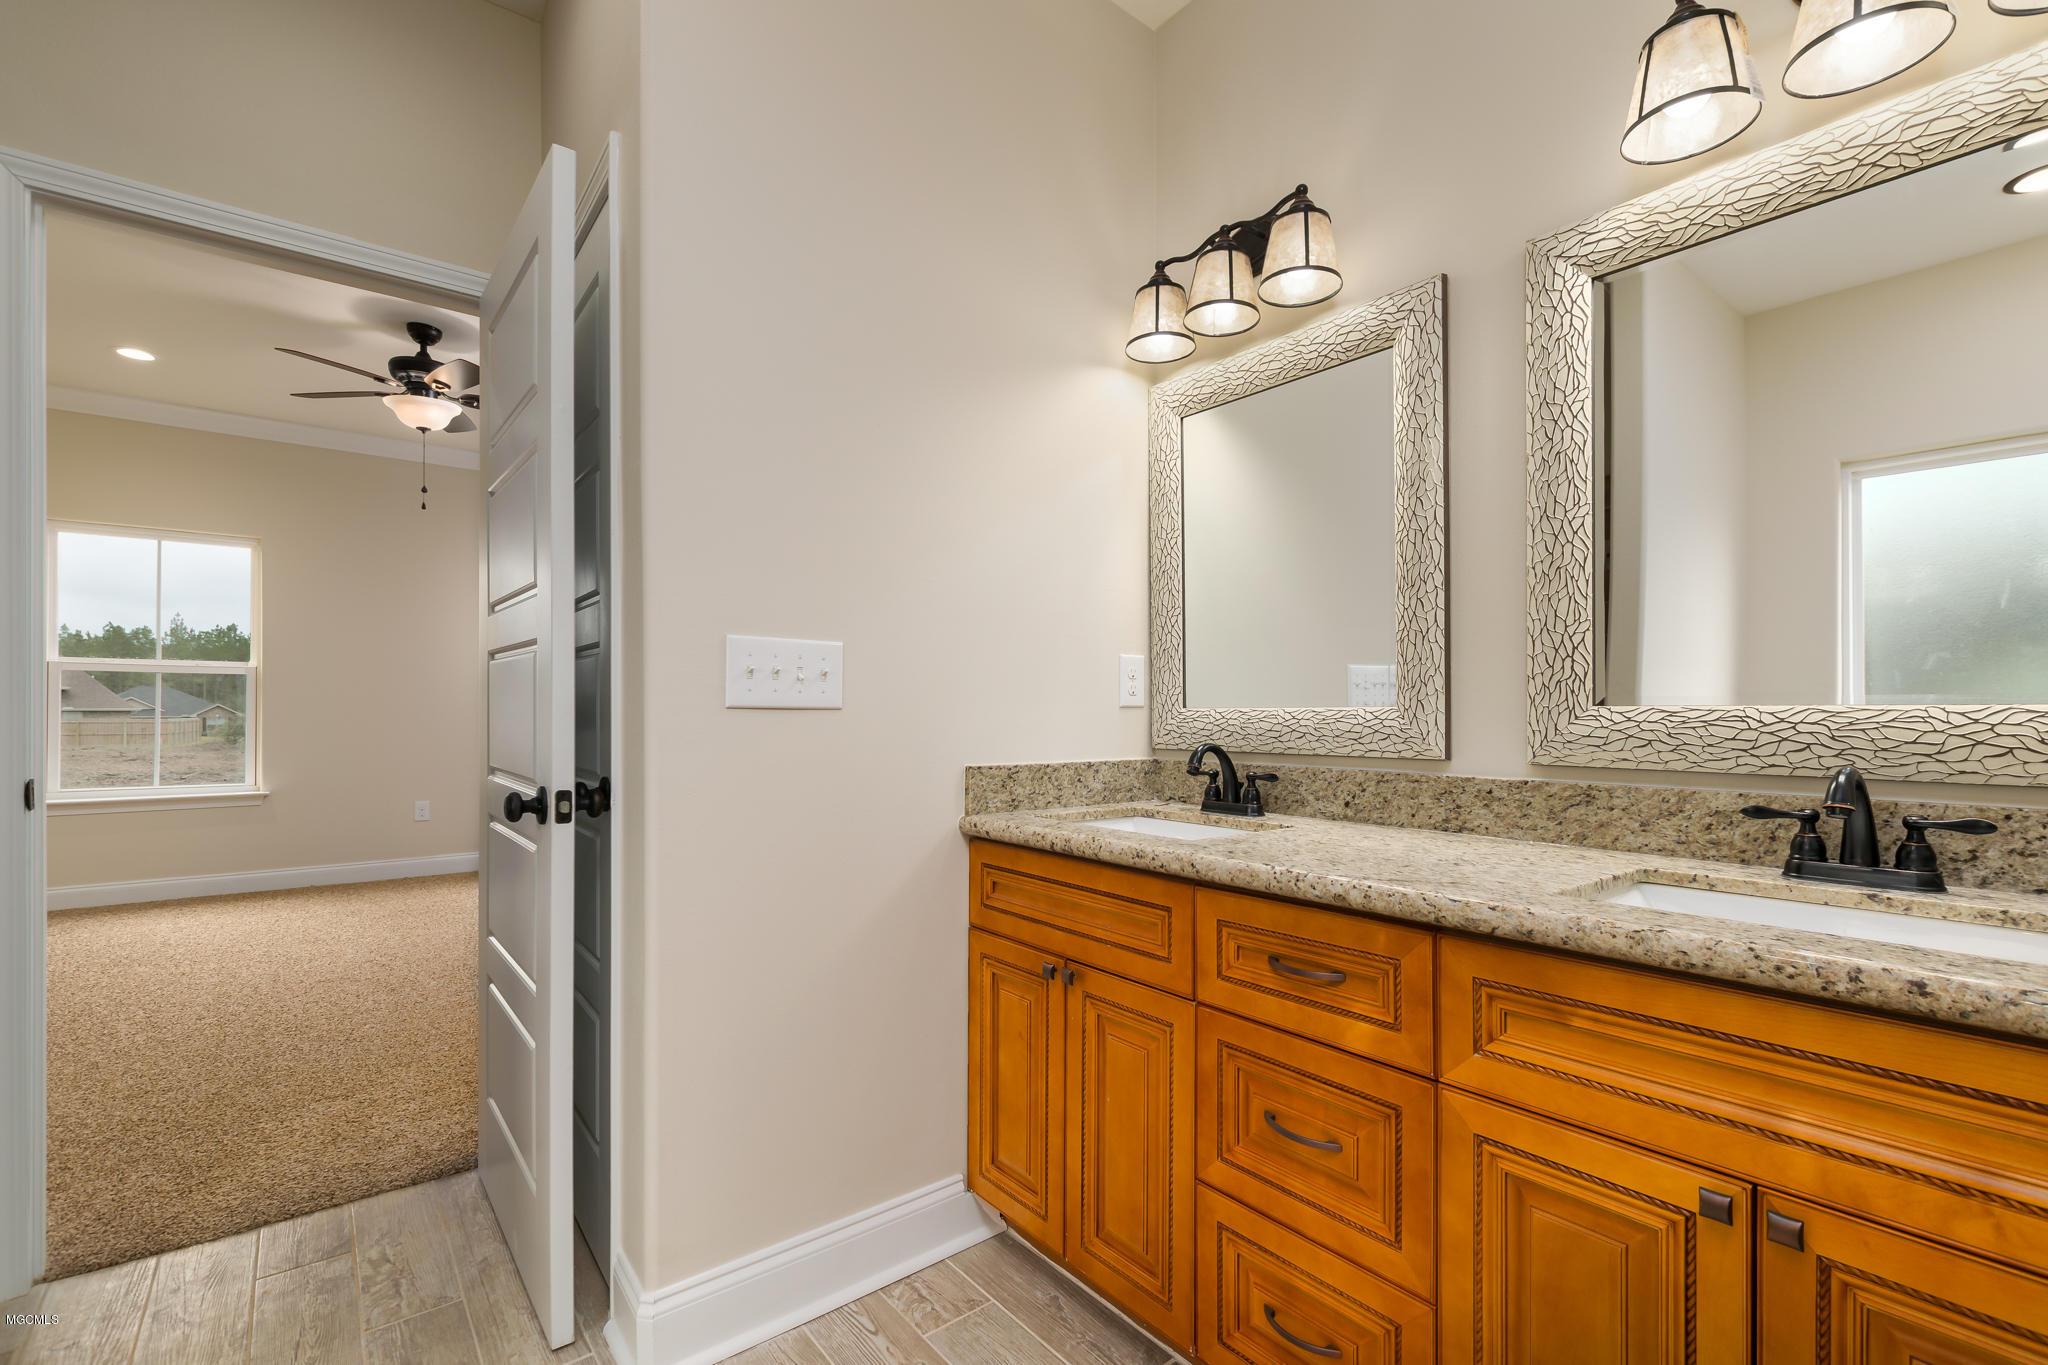 21660 Sandstone Ln, Gulfport, Mississippi 39503, 3 Bedrooms Bedrooms, ,2 BathroomsBathrooms,Single-family,For Sale,Sandstone,340877